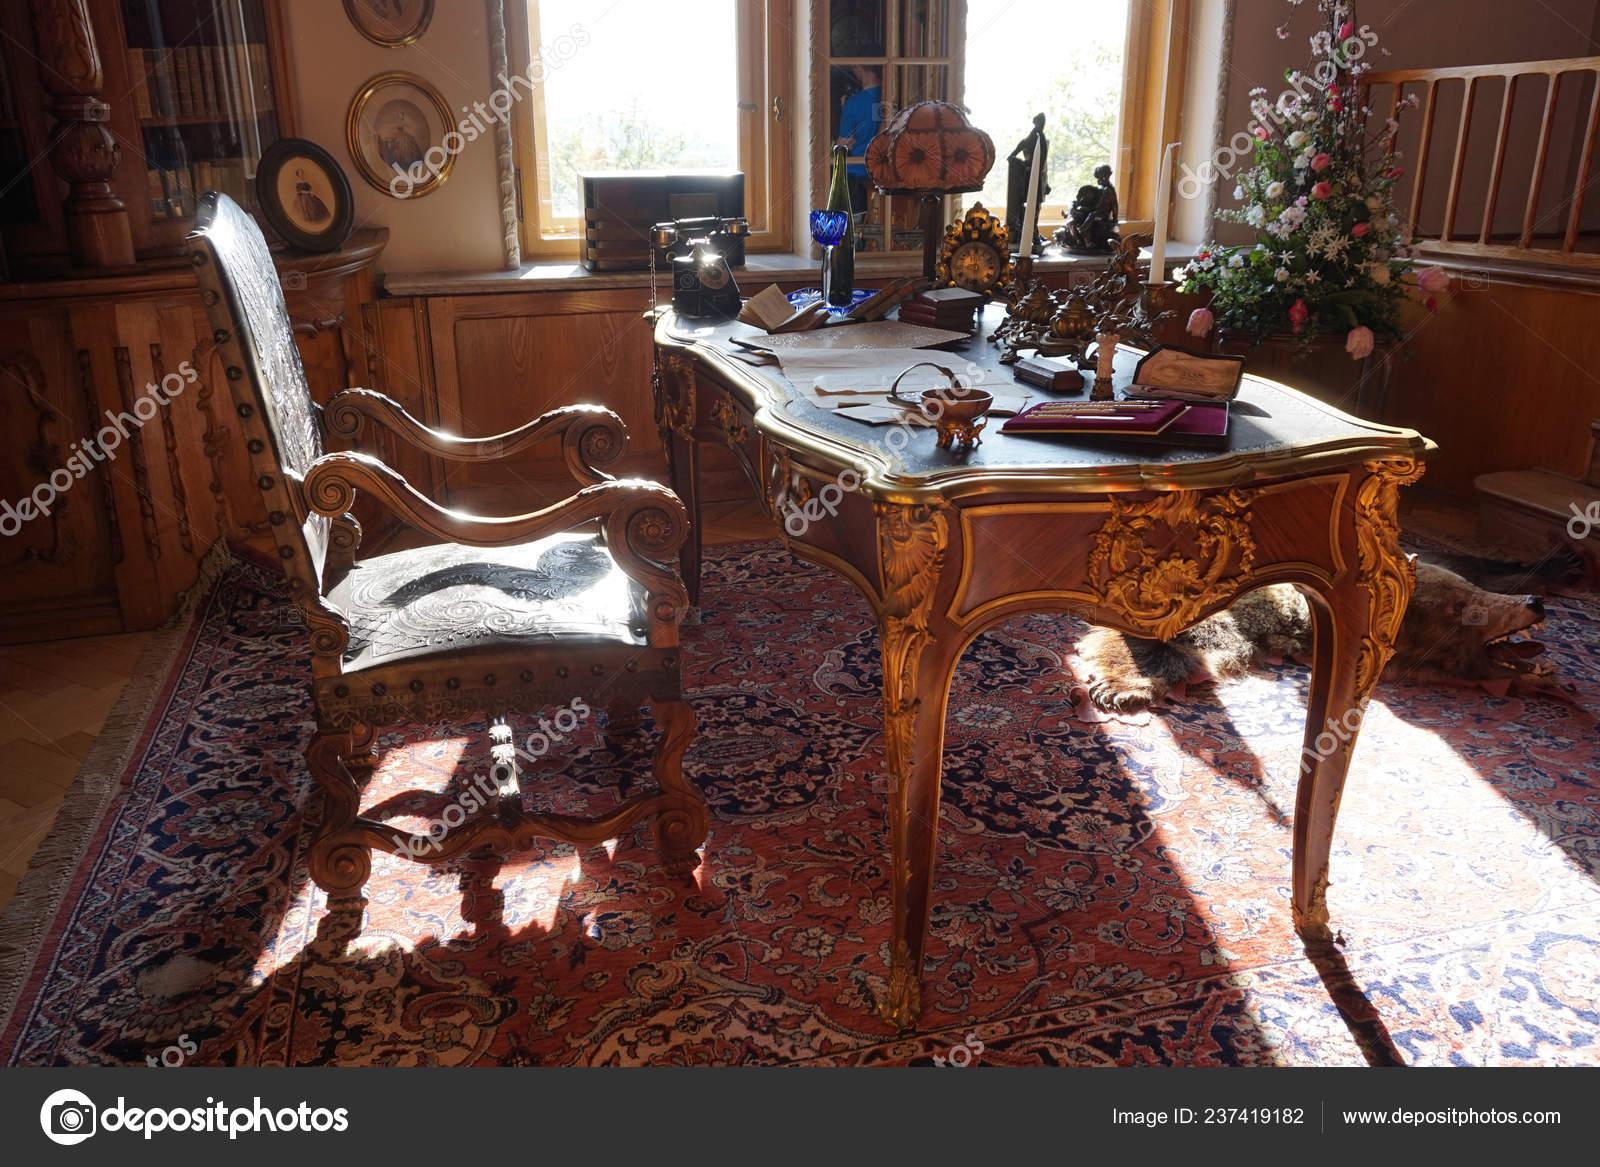 Old Office Interior Very Nice Background Stock Photo C Jonnysek 237419182